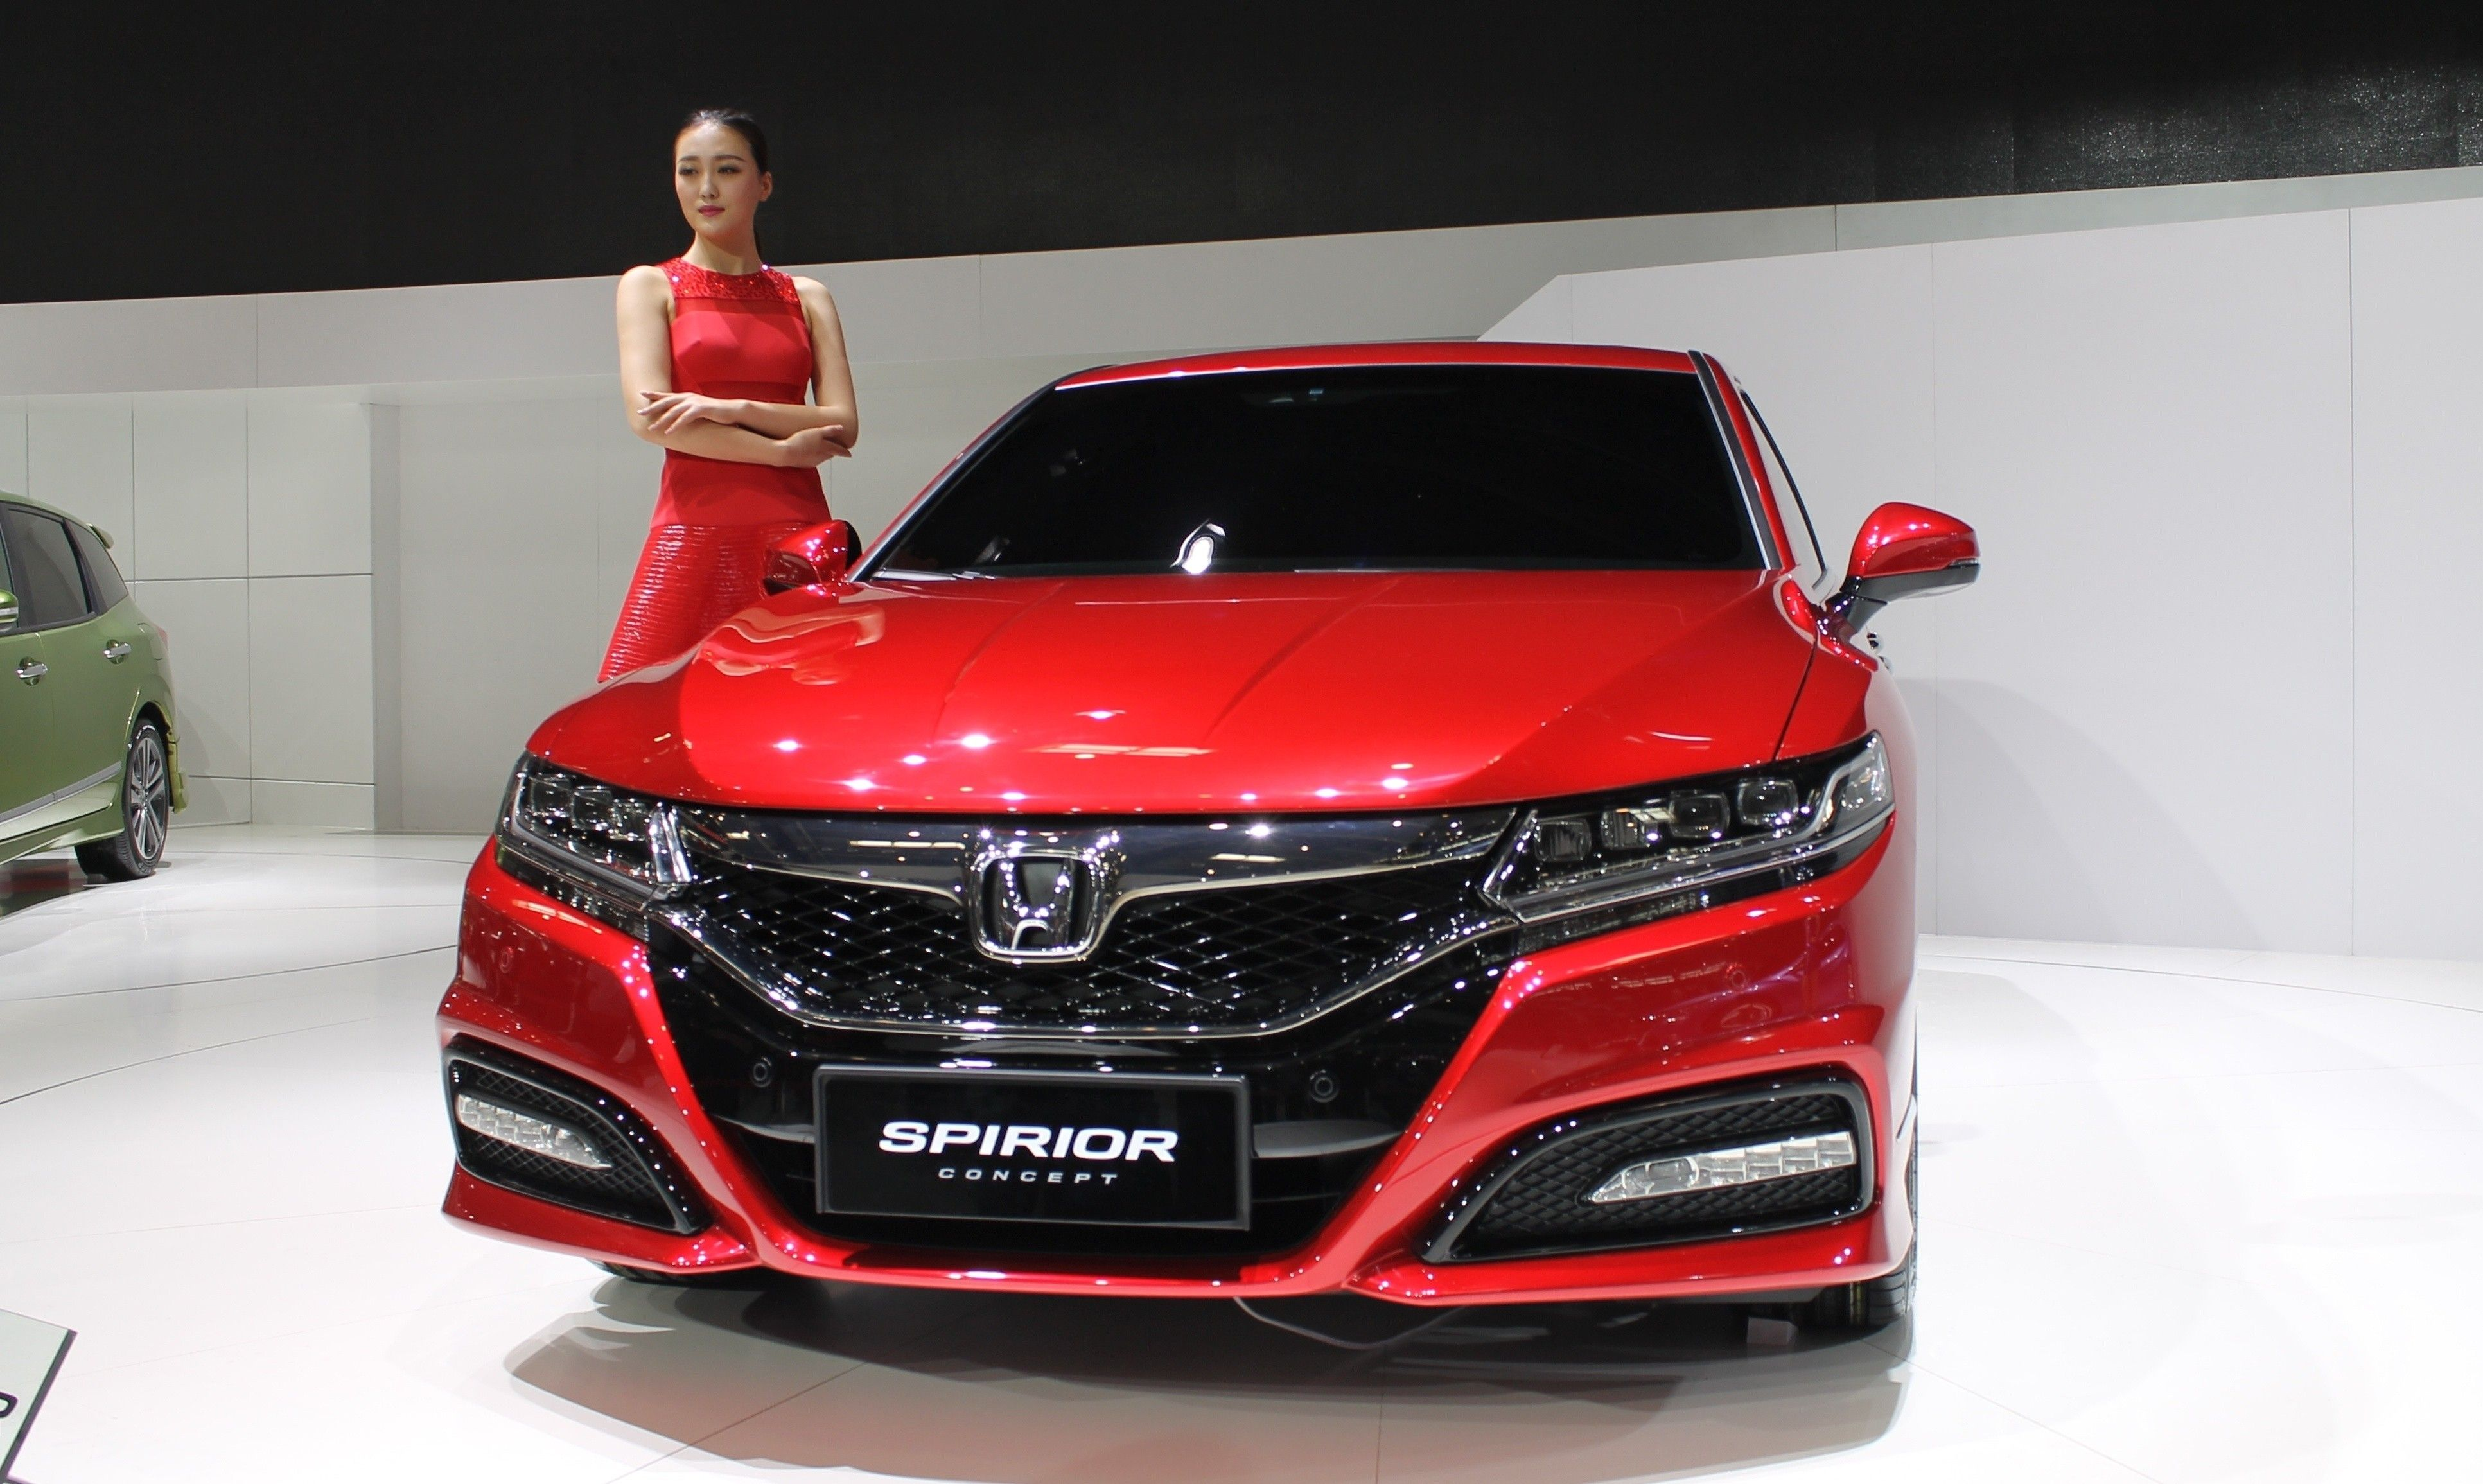 2019 Honda Accord Spirior Honda accord, Honda accord